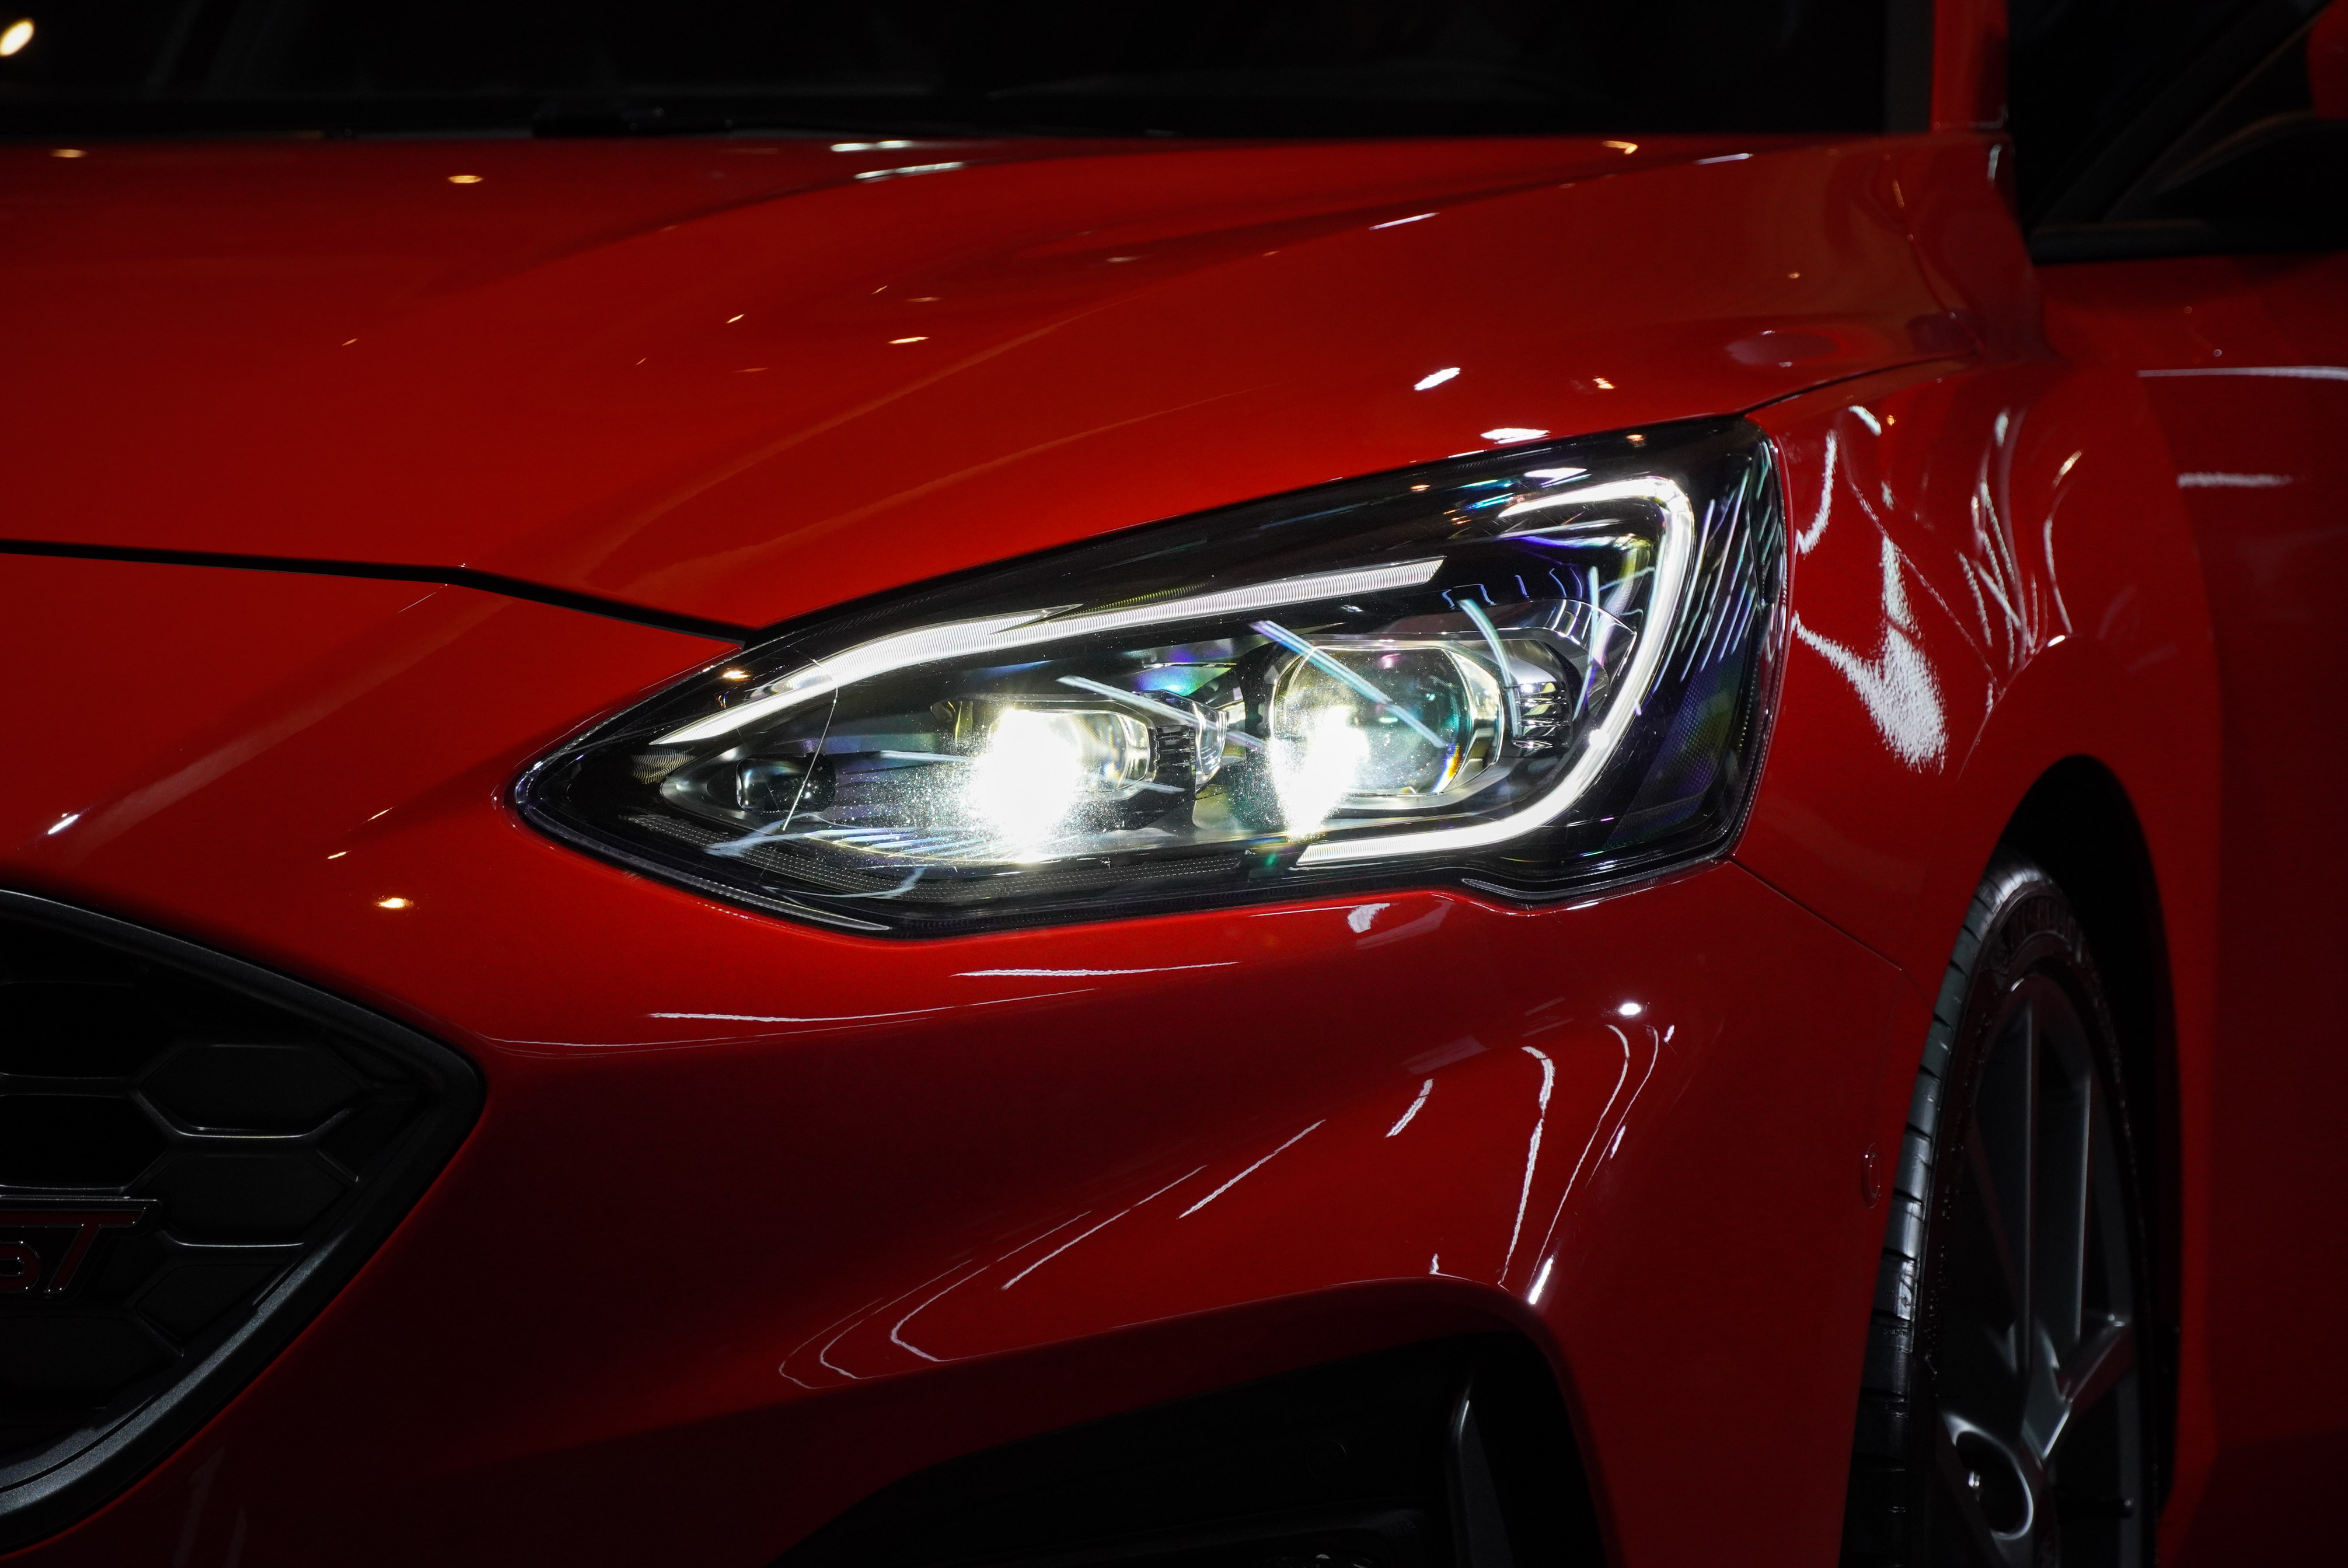 Ford Focus ST Wagon採用專屬「旭日之刃型LED日行燈」,整合AFS頭燈主動式轉向照明輔助系統。